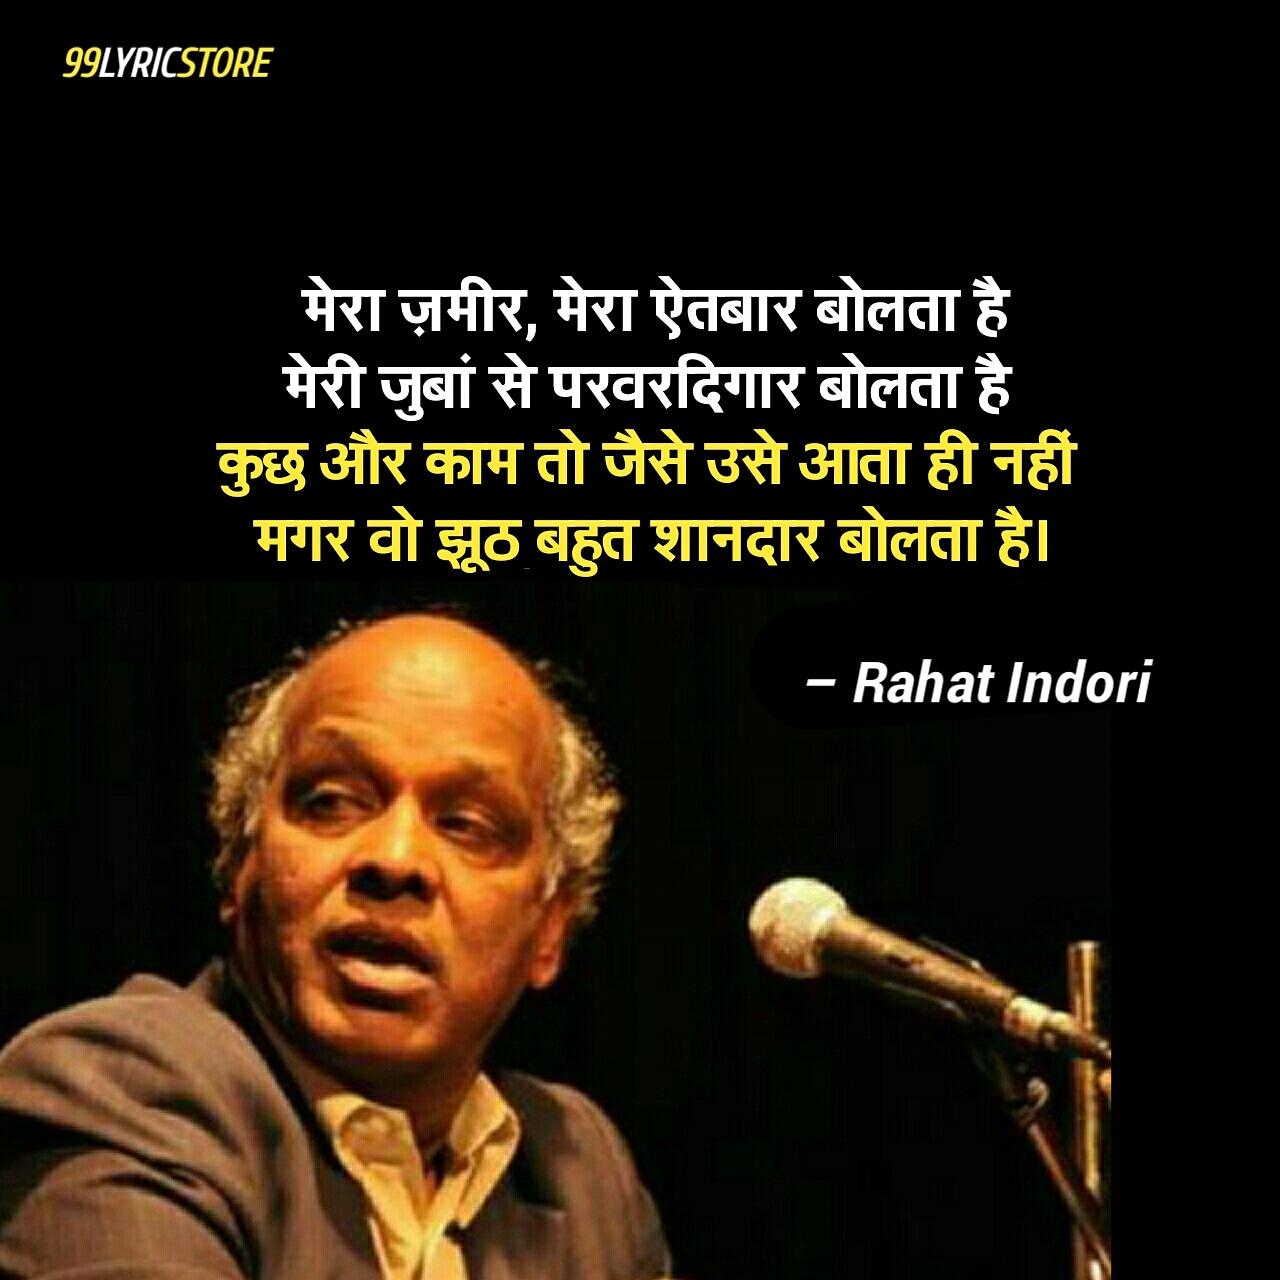 'Mera Zameer Mera Aitbaar Bolta Hai' written and performed by Rahat Indori. This poetry is best Ghazal and Shayari of Rahat Indori.